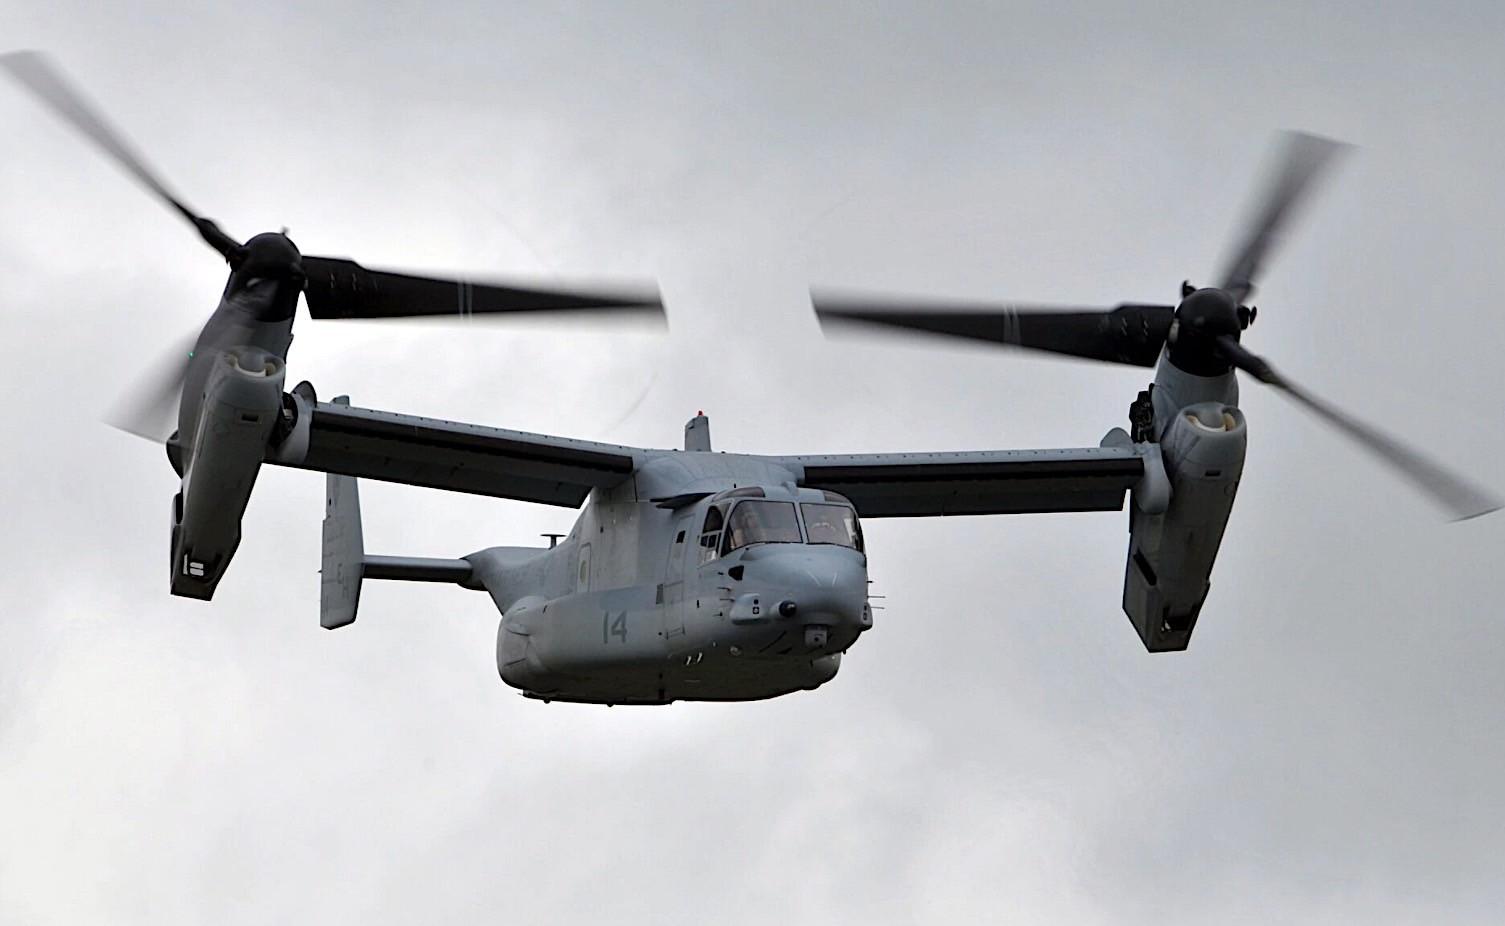 V-22 Osprey Tiltrotor Aircraft Reaches 600,000 Flight-Hours Milestone -  autoevolution